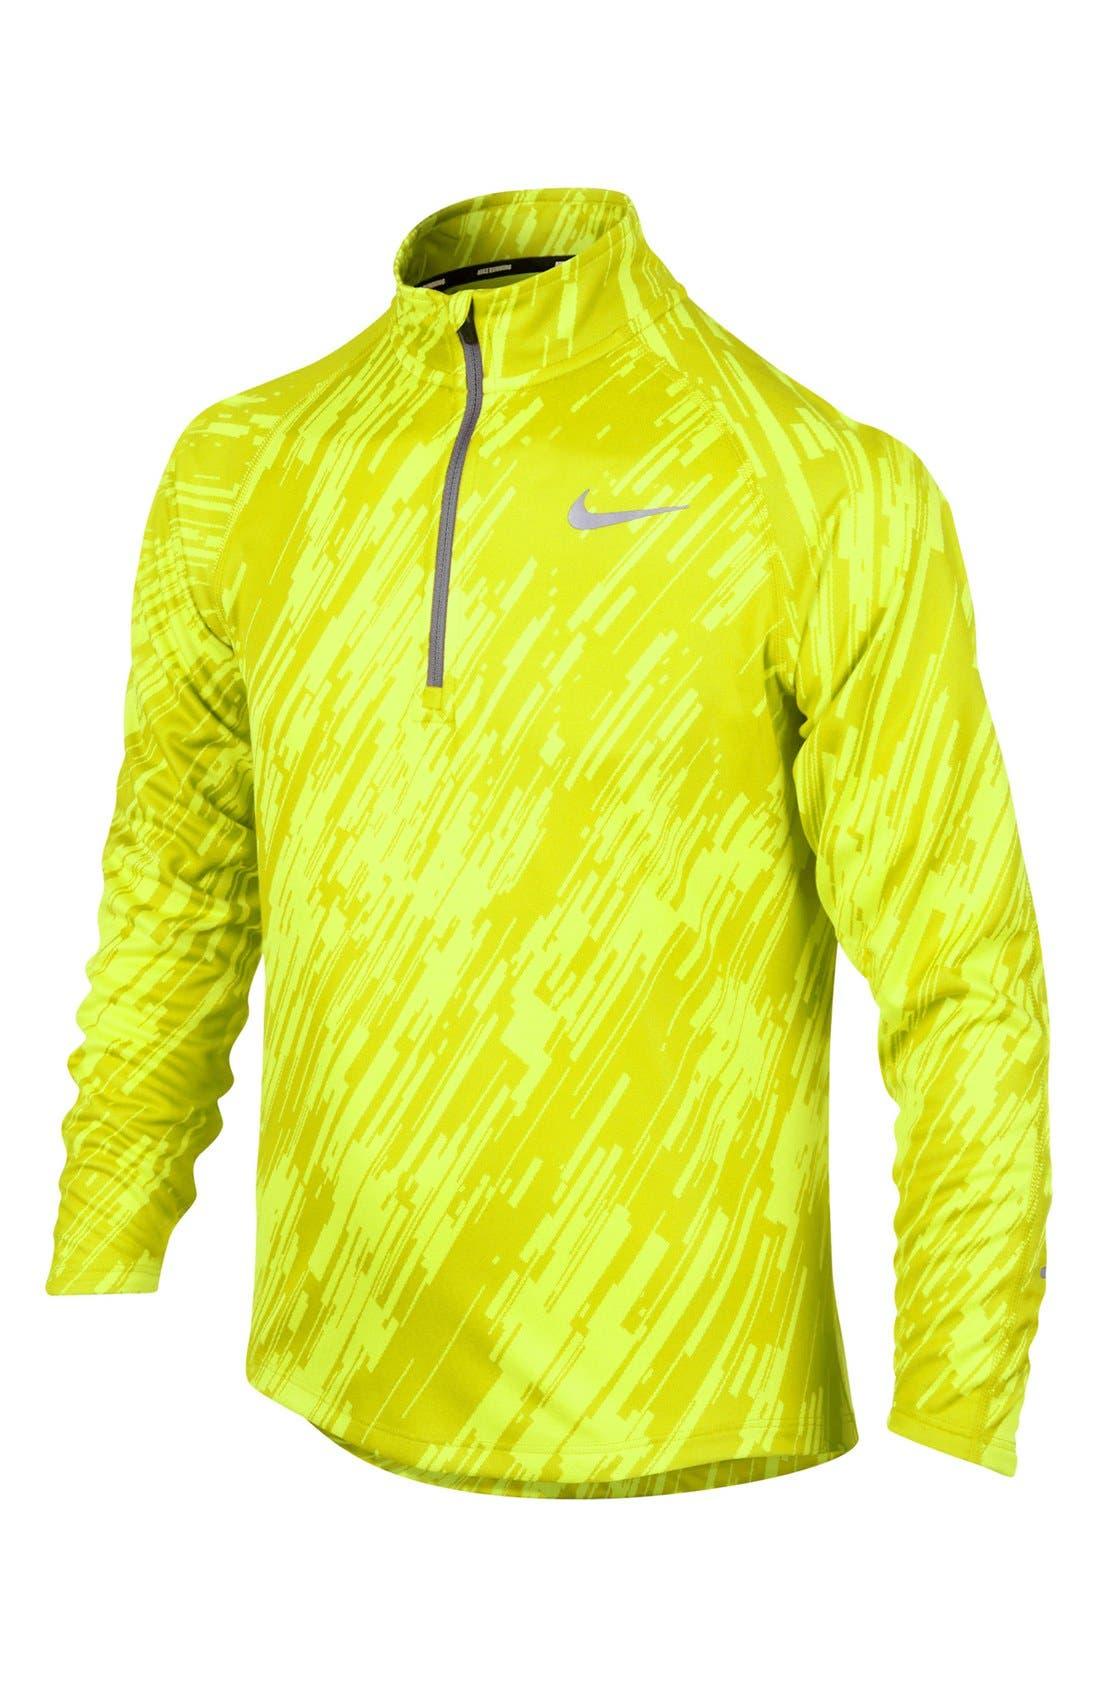 Alternate Image 1 Selected - Nike 'Element' Jacquard Half Zip Running Top (Big Boys)